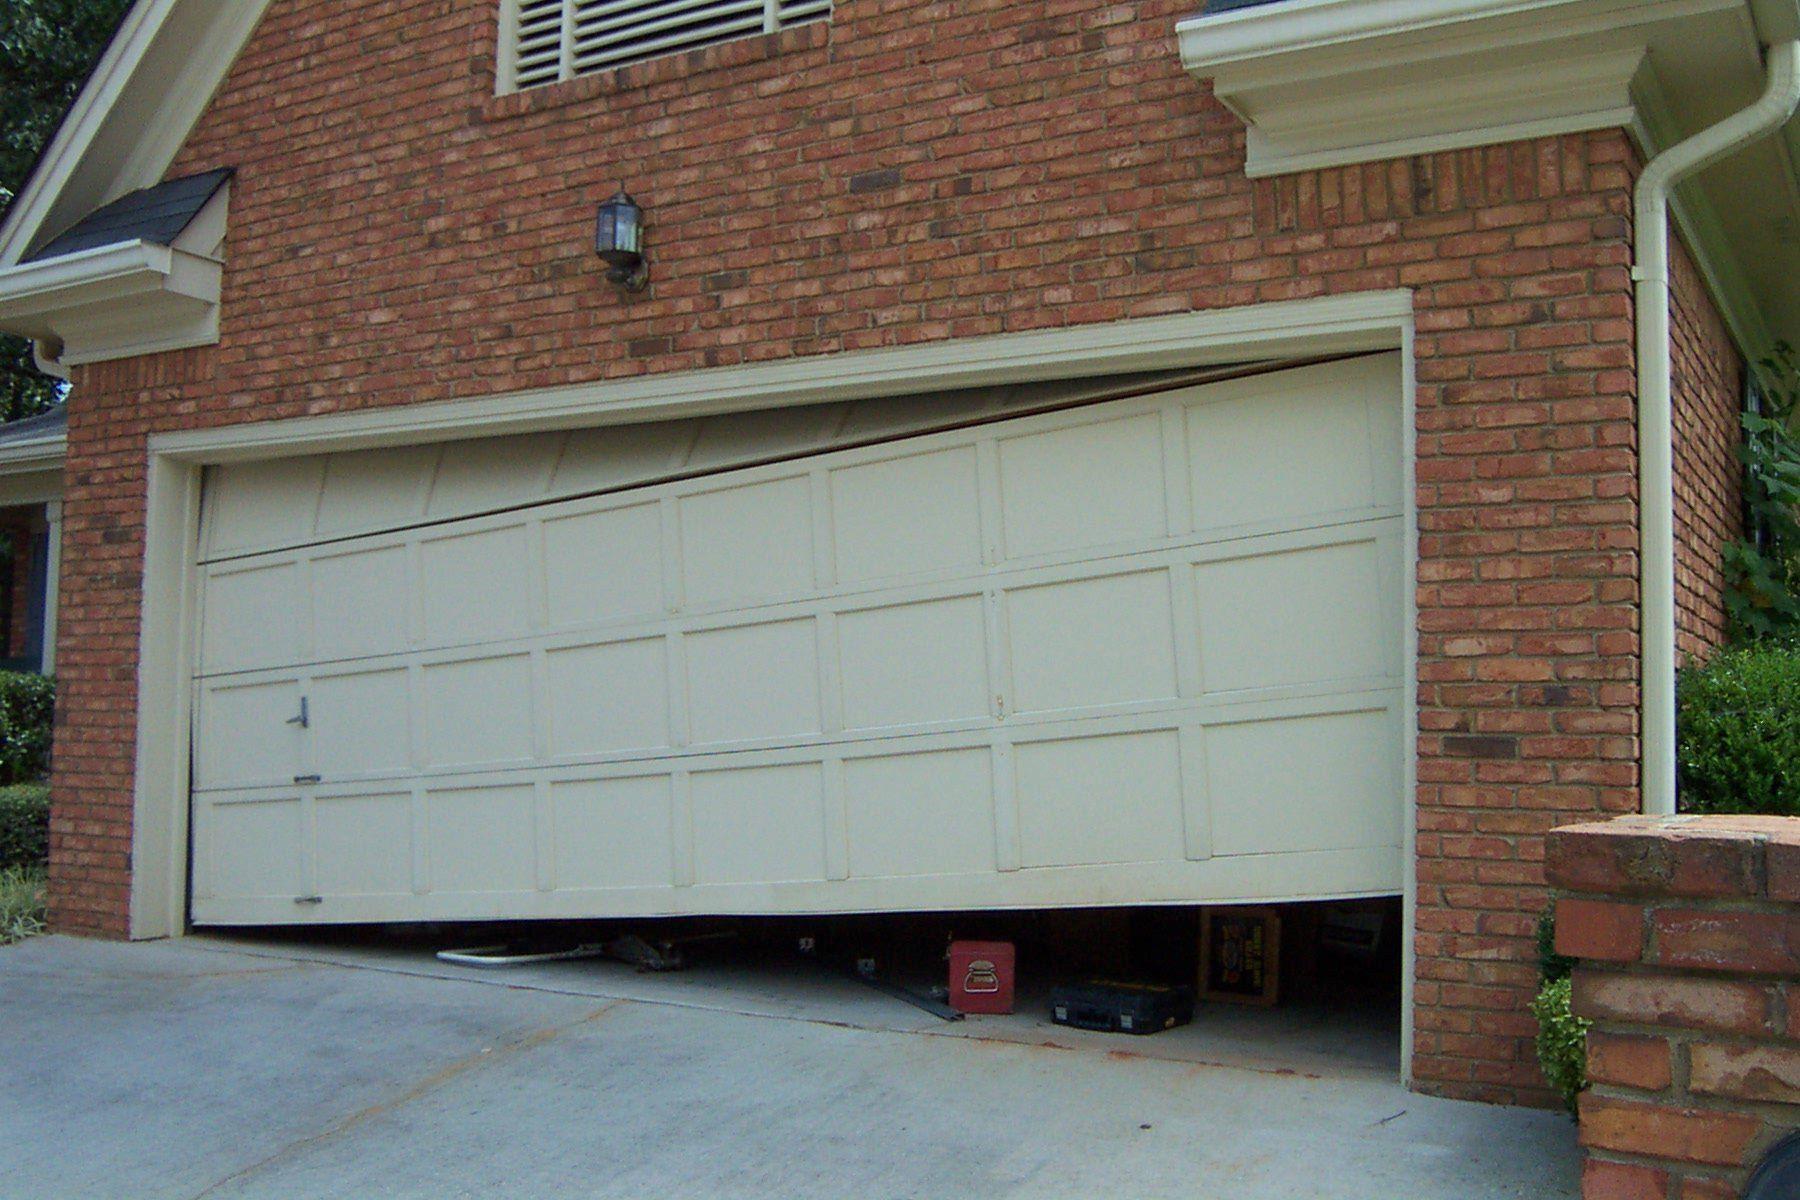 43 Awesome Garage Doors Design Ideas